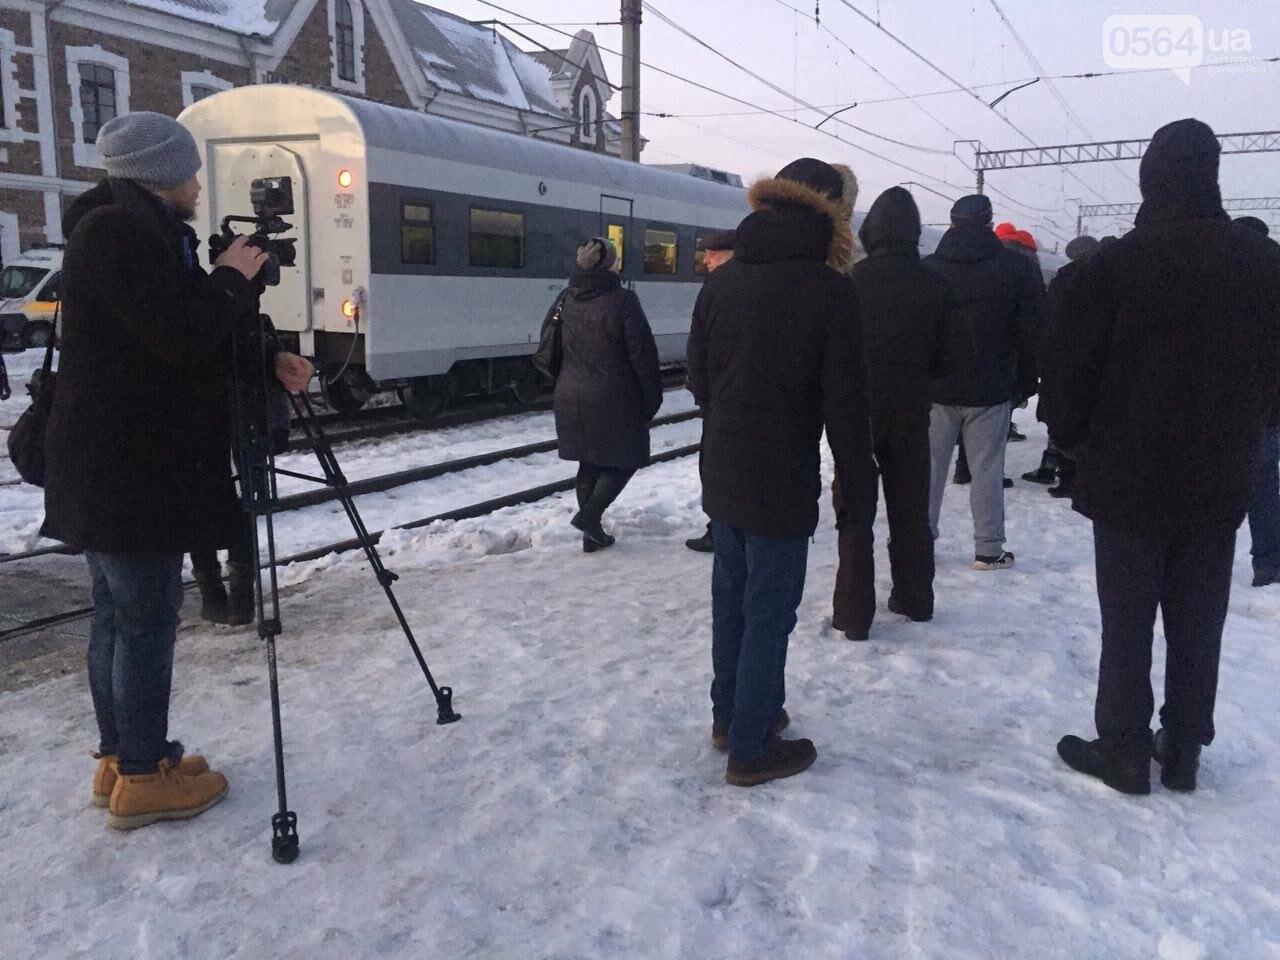 В Кривой Рог вернулся журналист Вячеслав Волк, тяжело раненый во время учений резервистов (ФОТО), фото-15